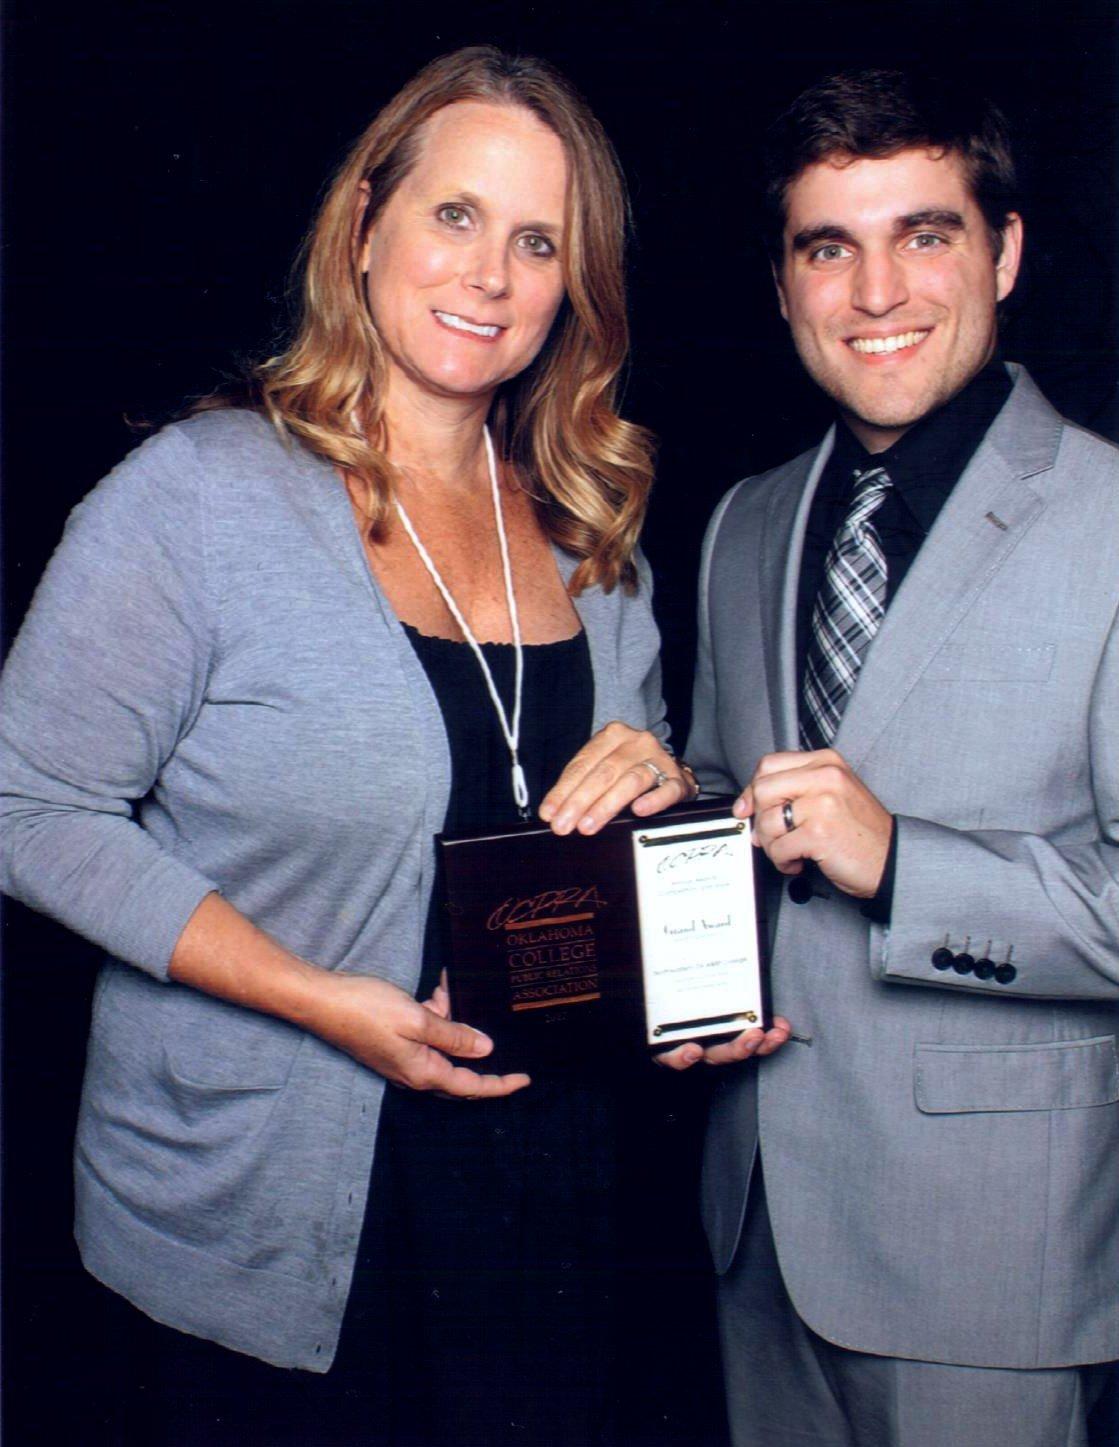 Jennifer Walker and Jordan Adams accepted awards on behalf of NEO.